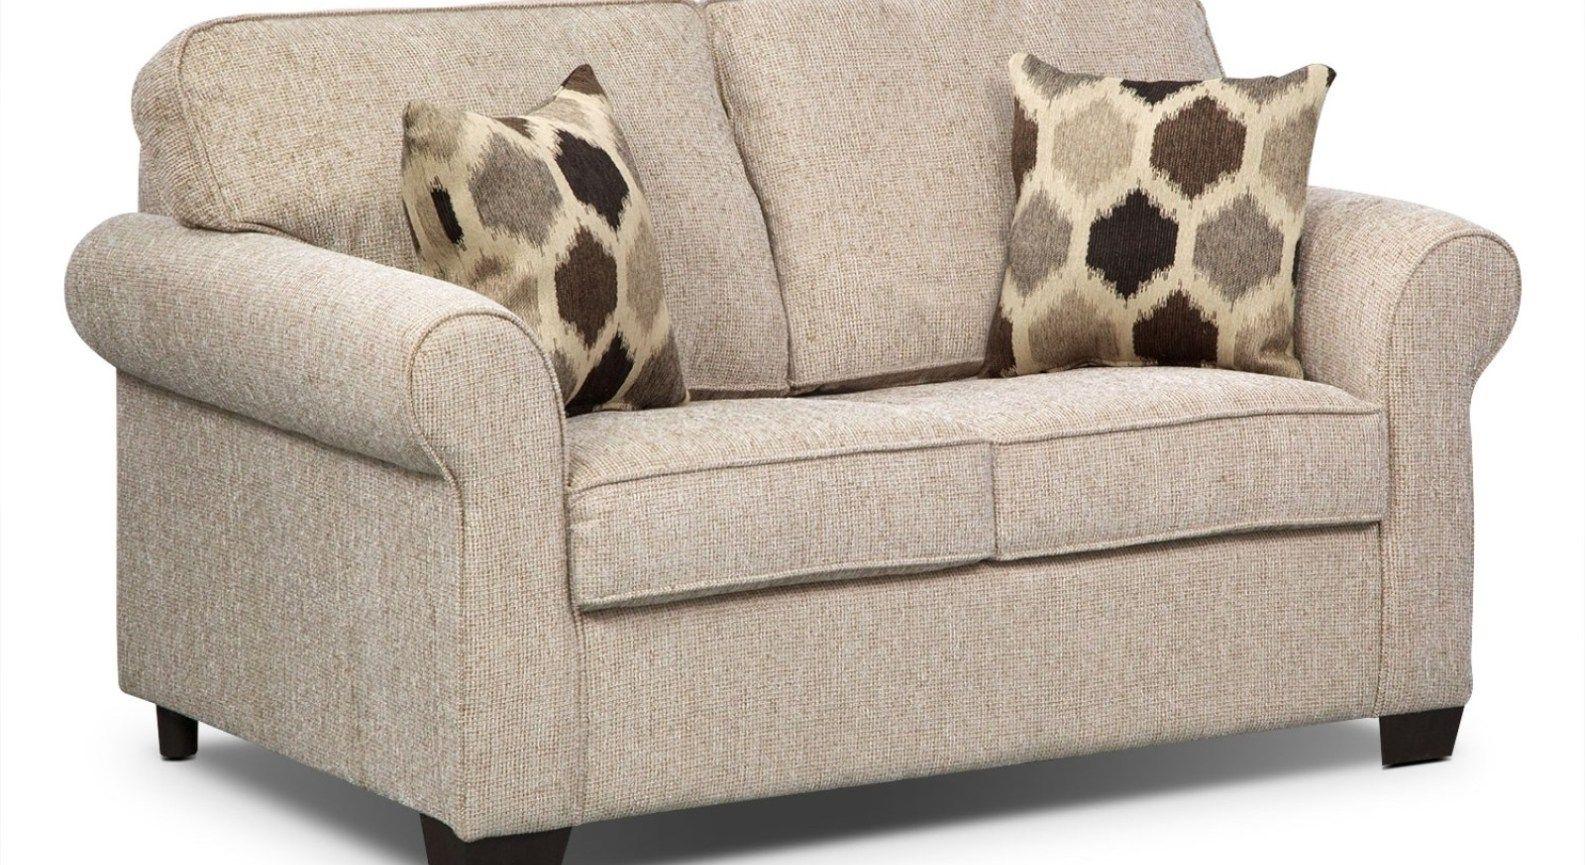 Blair leather full sleeper sofa bed tmidb pinterest